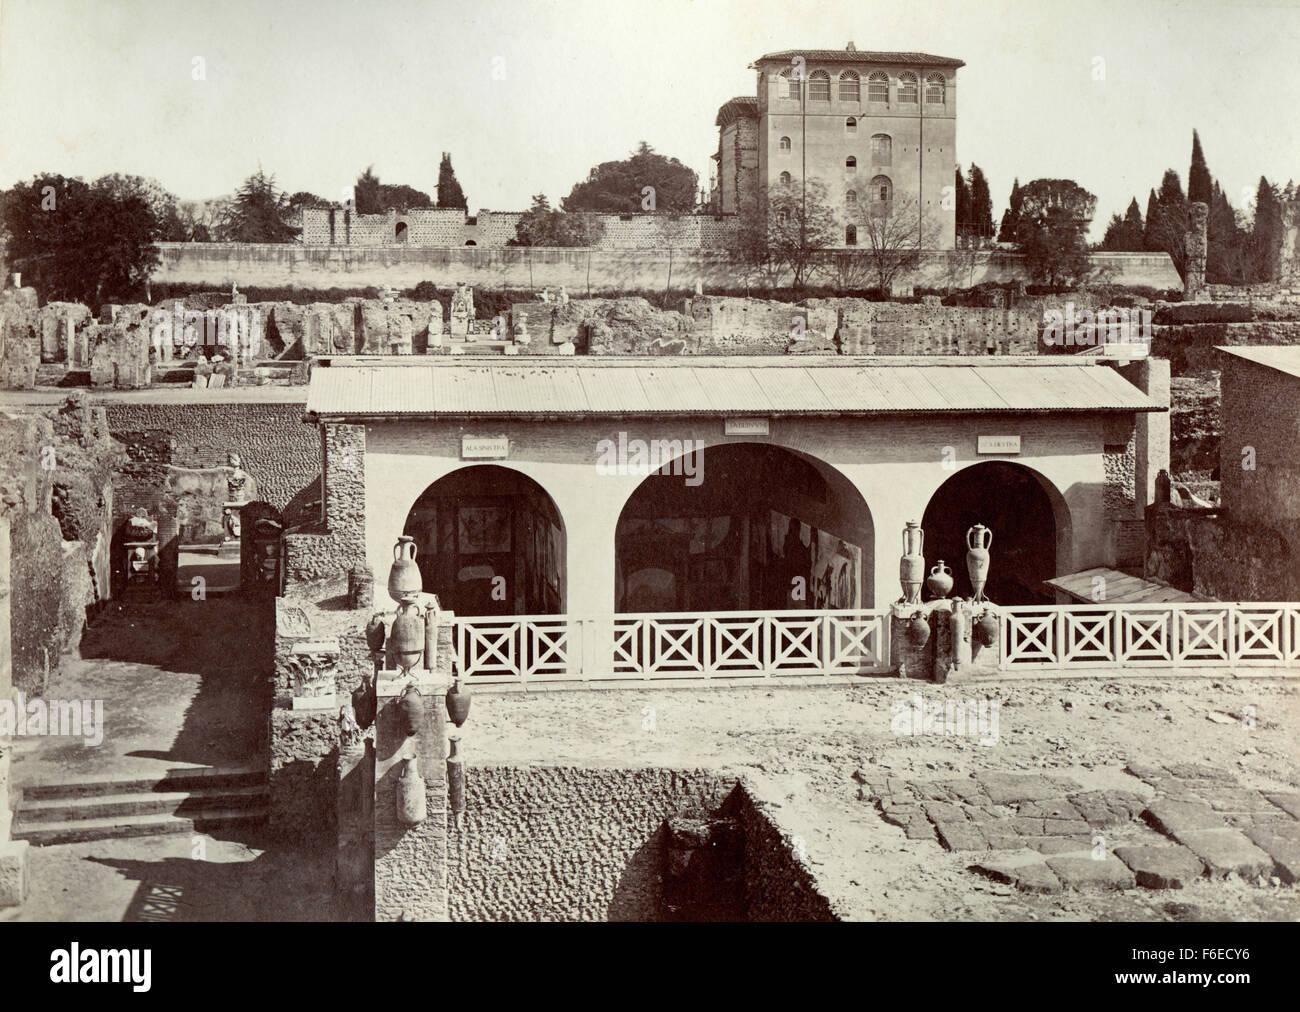 Palace of the Caesars, paternal house of Tiberius, Rome, Italy - Stock Image